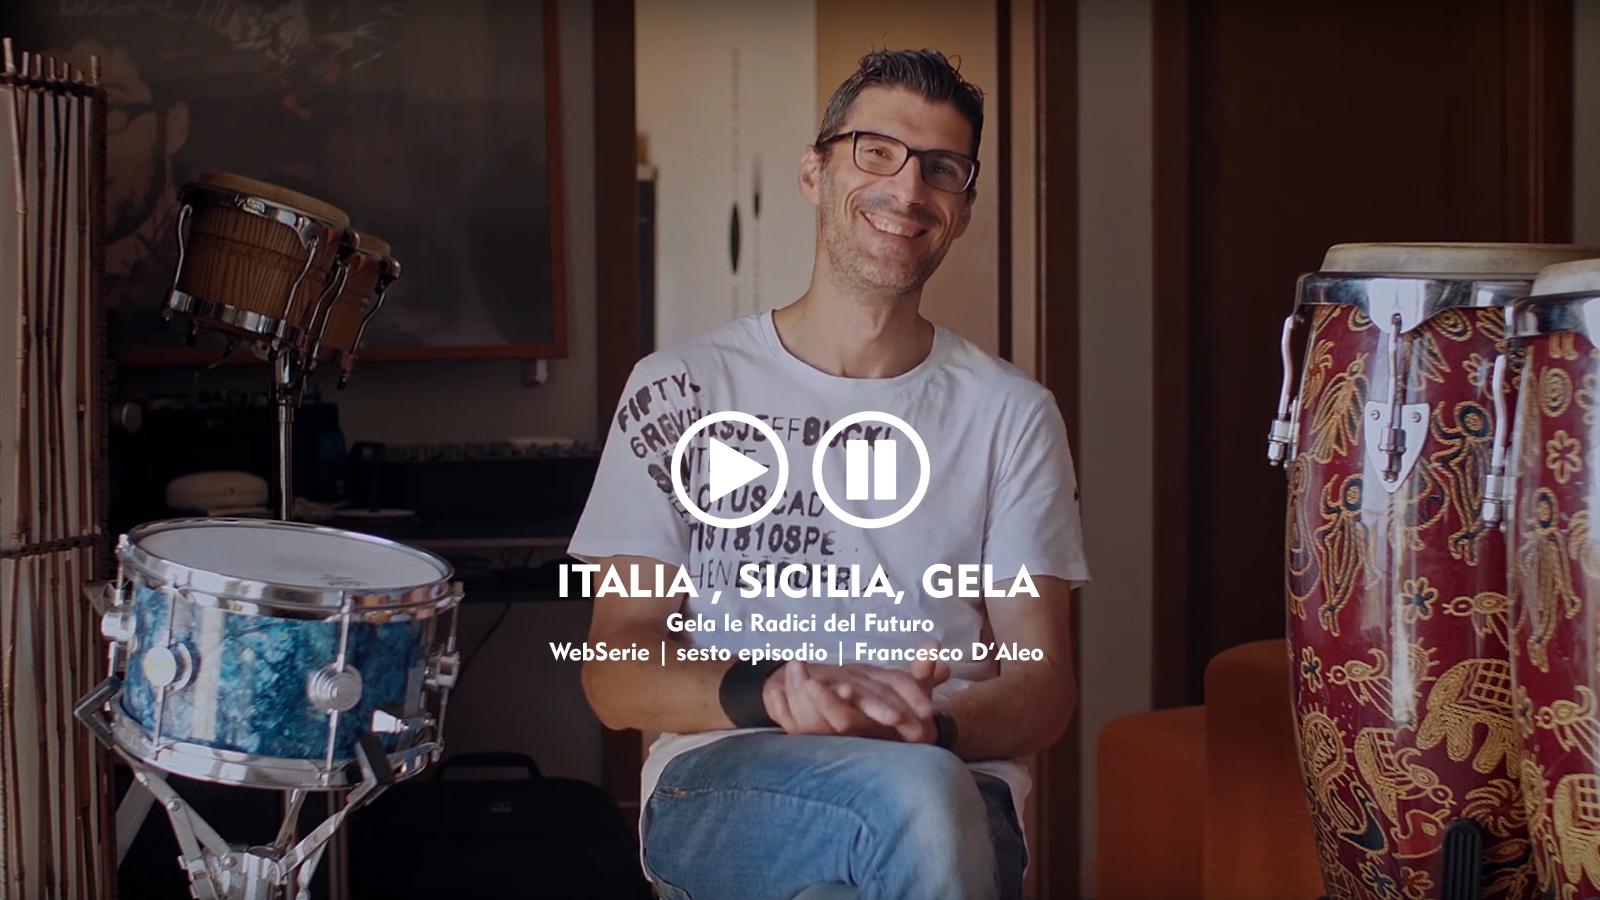 webserie | Italia, Sicilia, Gela | sesta puntata | Francesco